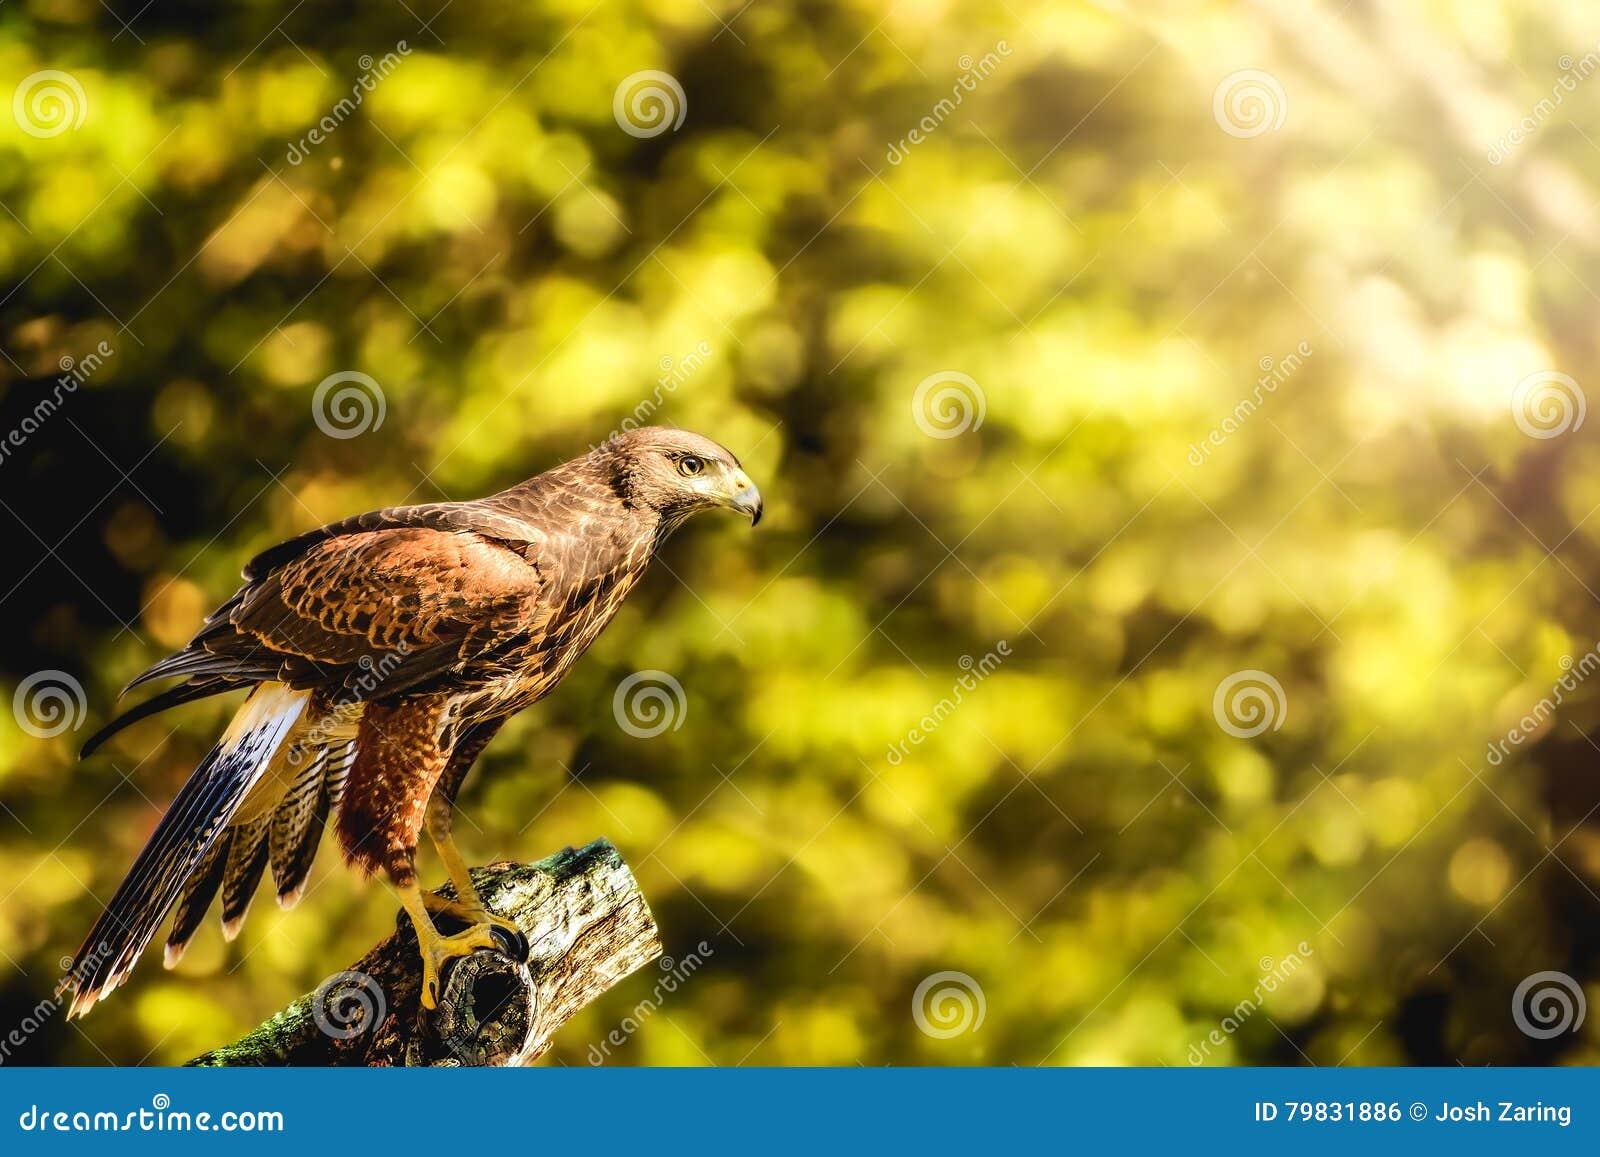 Wild Hawk Perched on Stump Sunlight